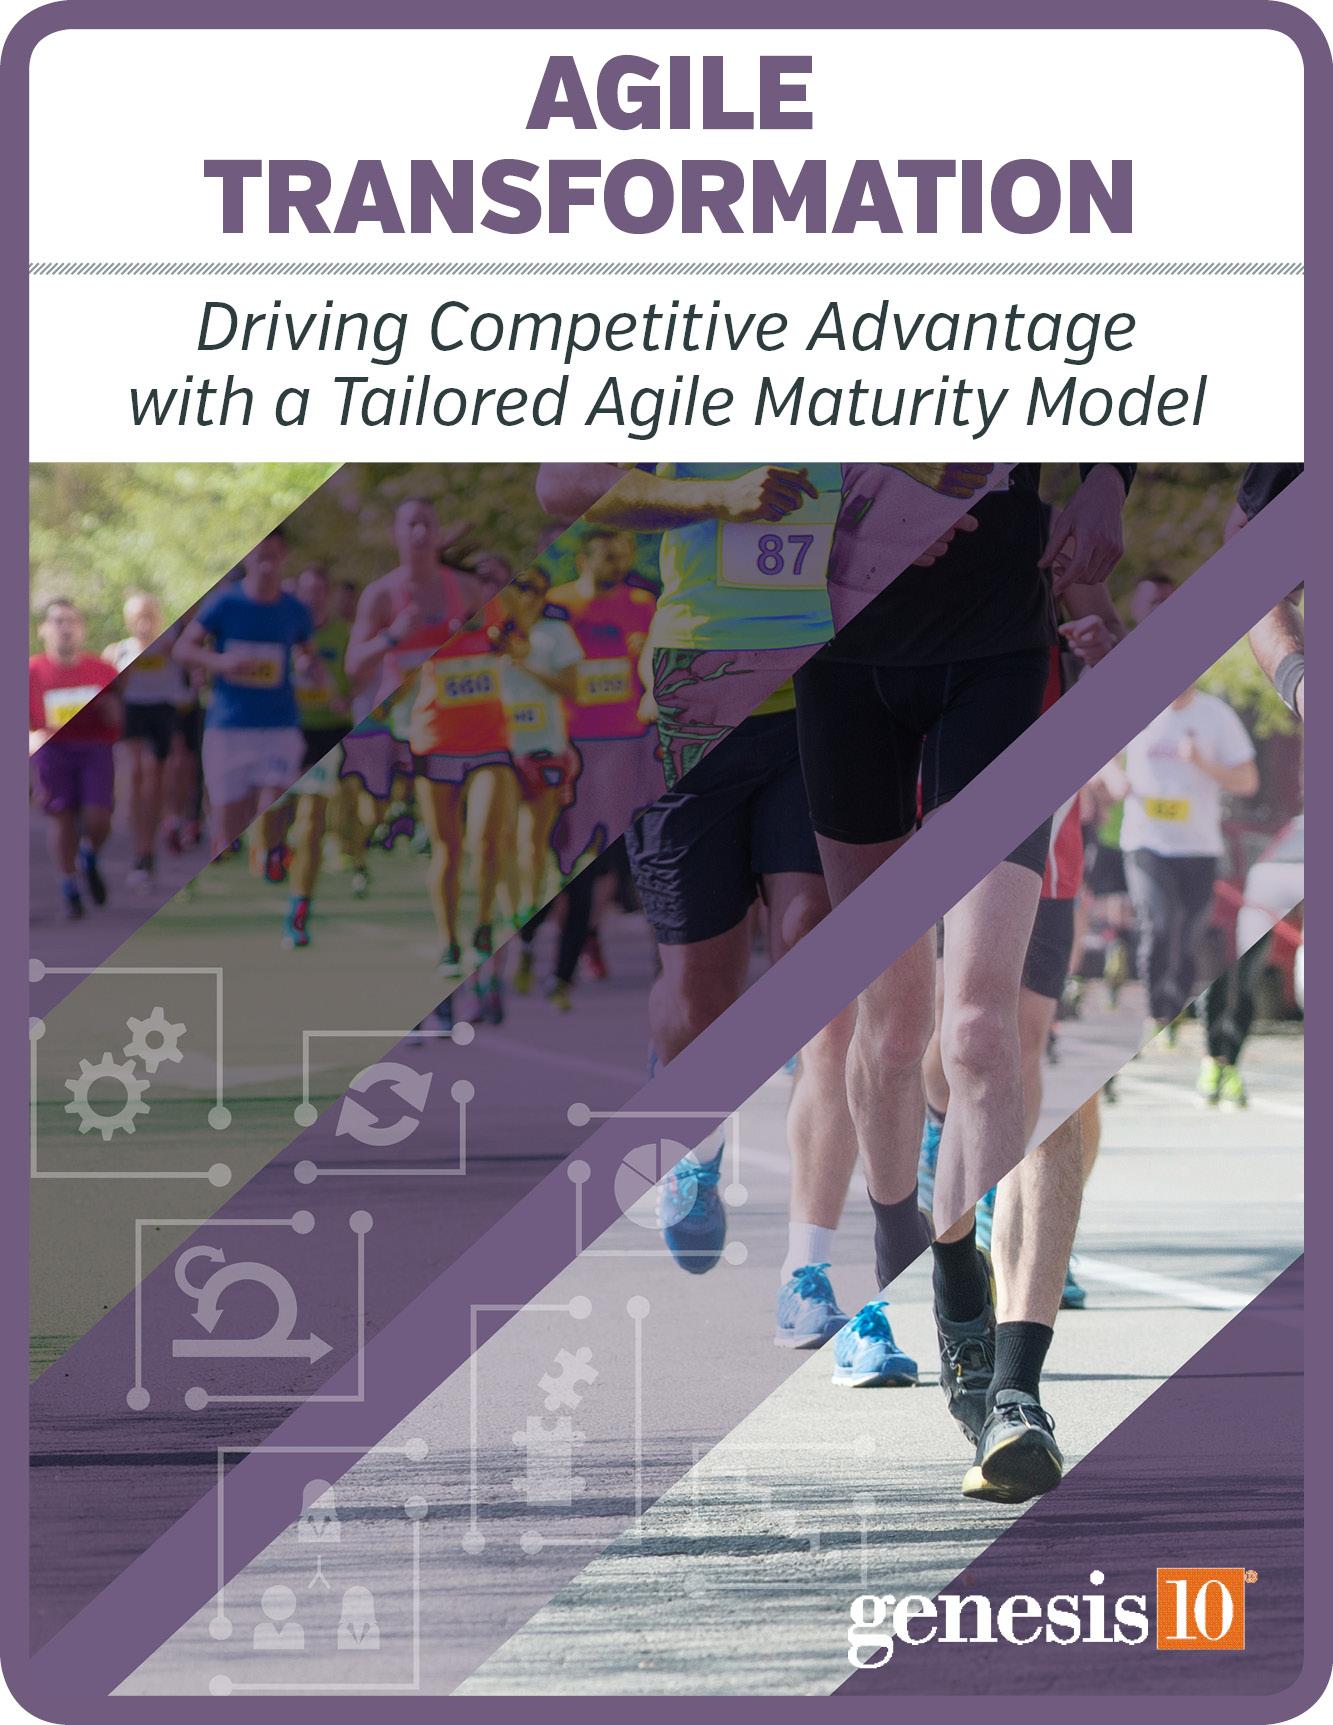 Genesis10 Whitepaper - Agile Transformation